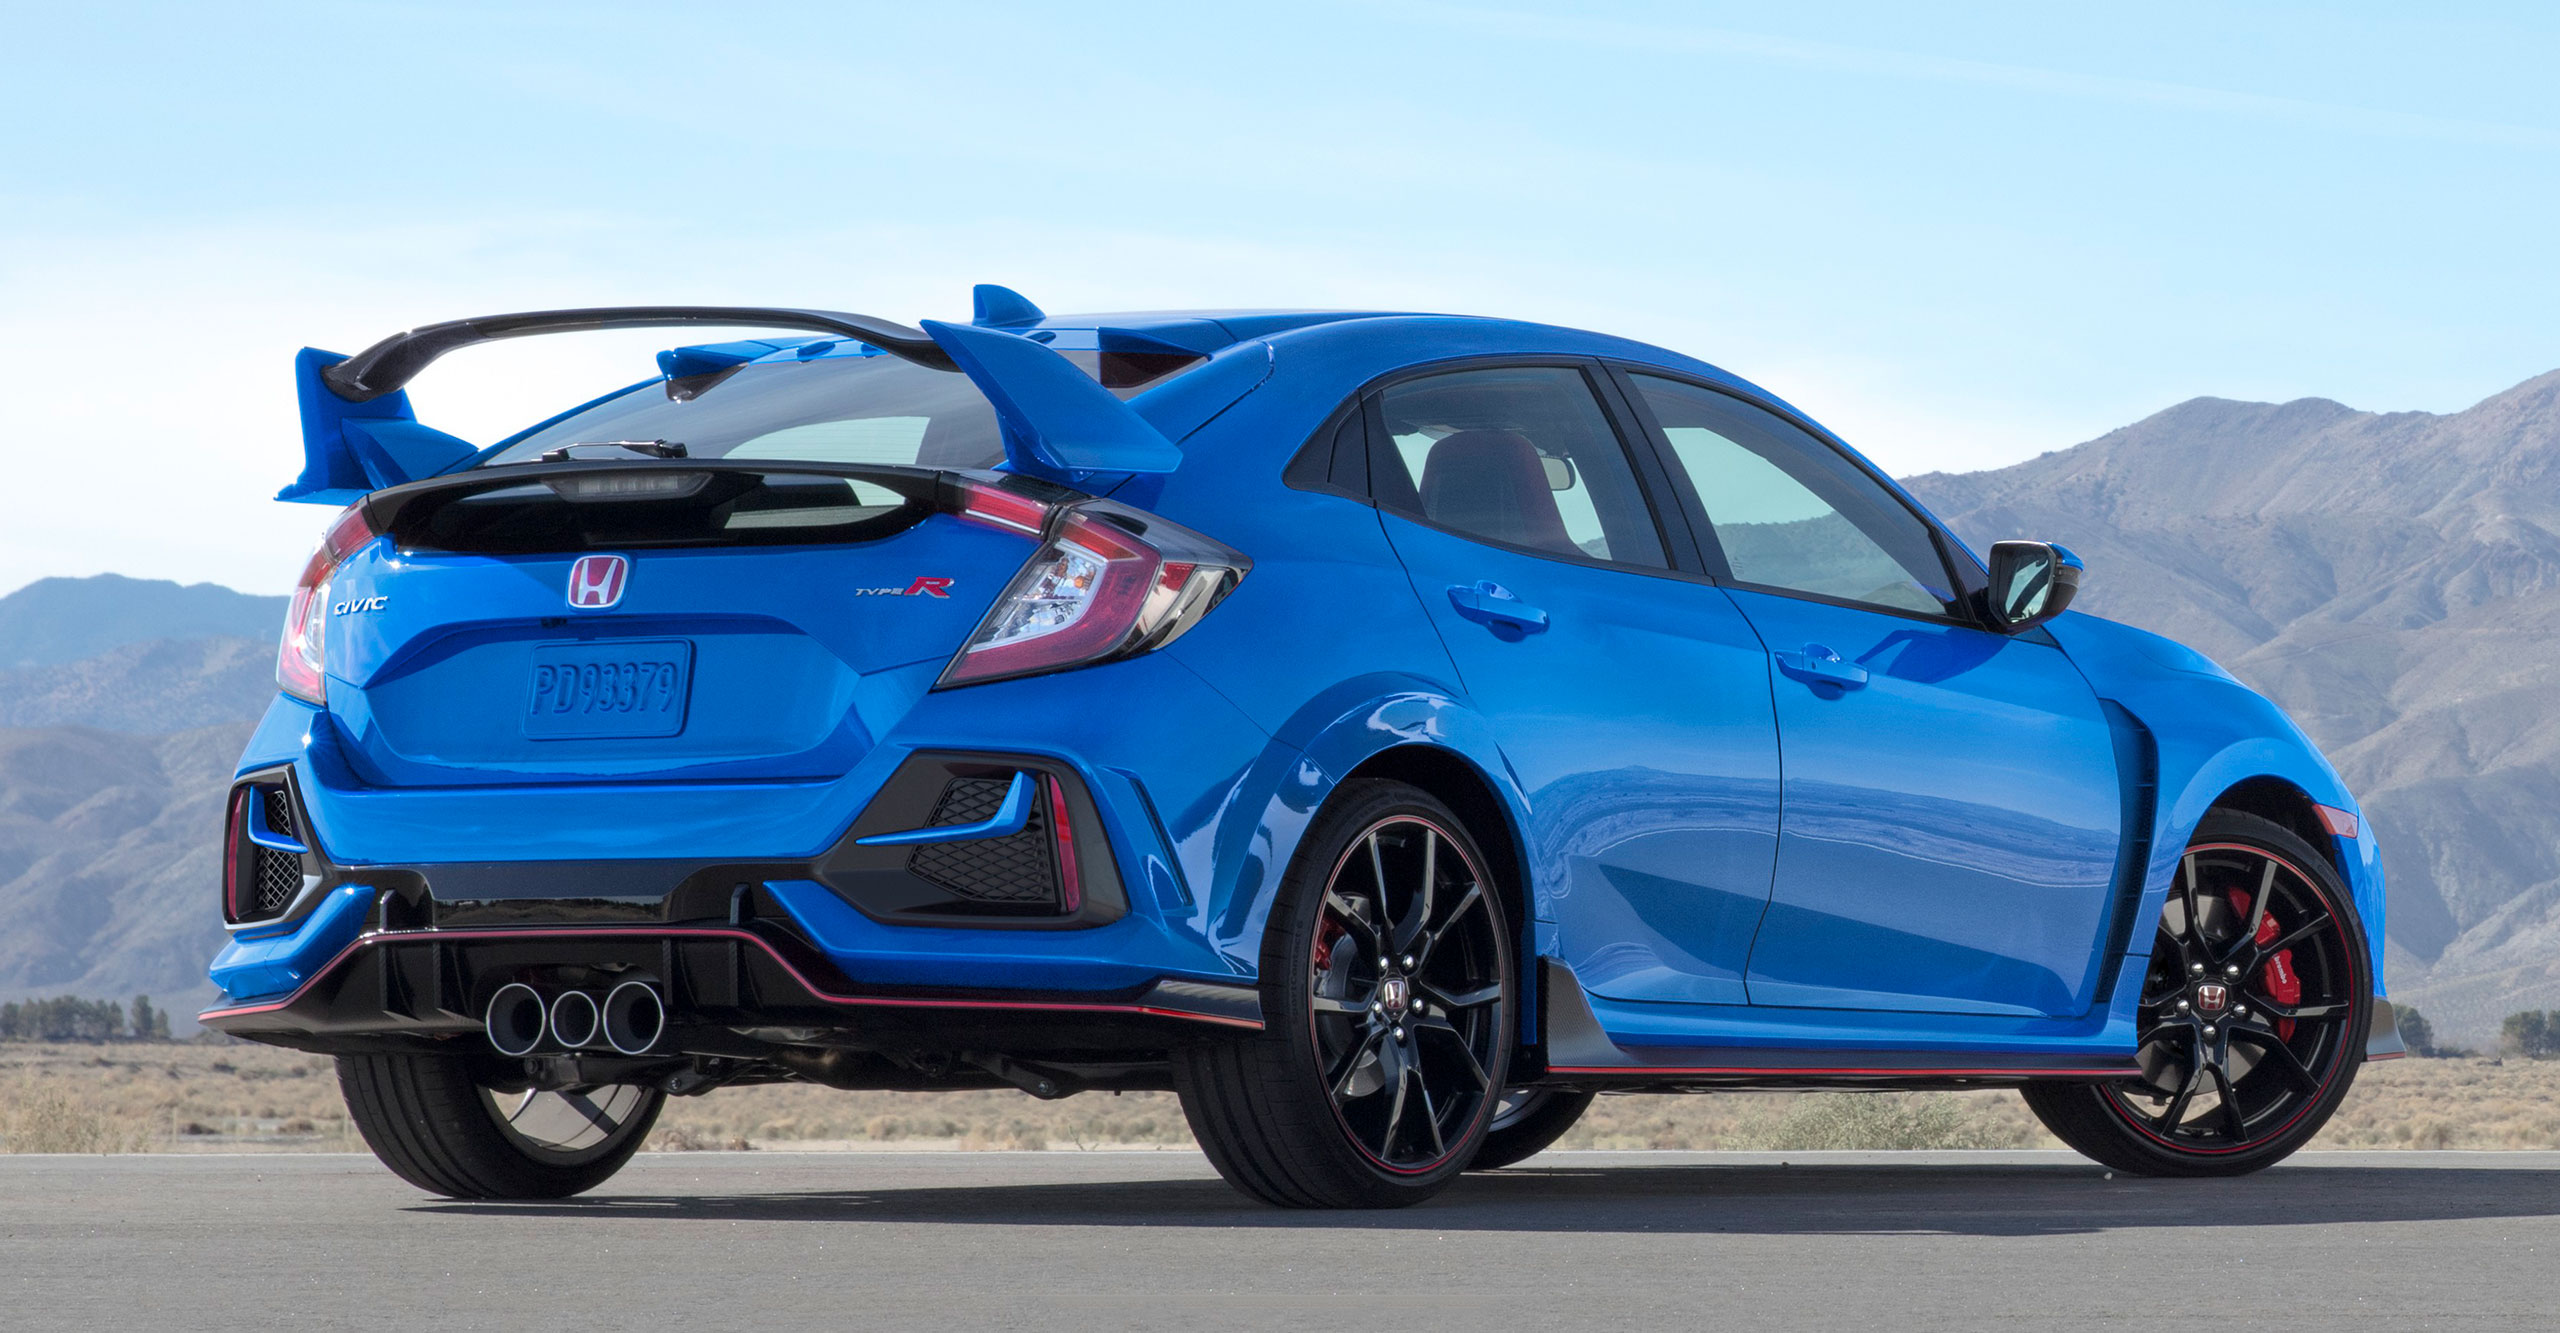 Kelebihan Kekurangan Civic Type R Fk8 Top Model Tahun Ini